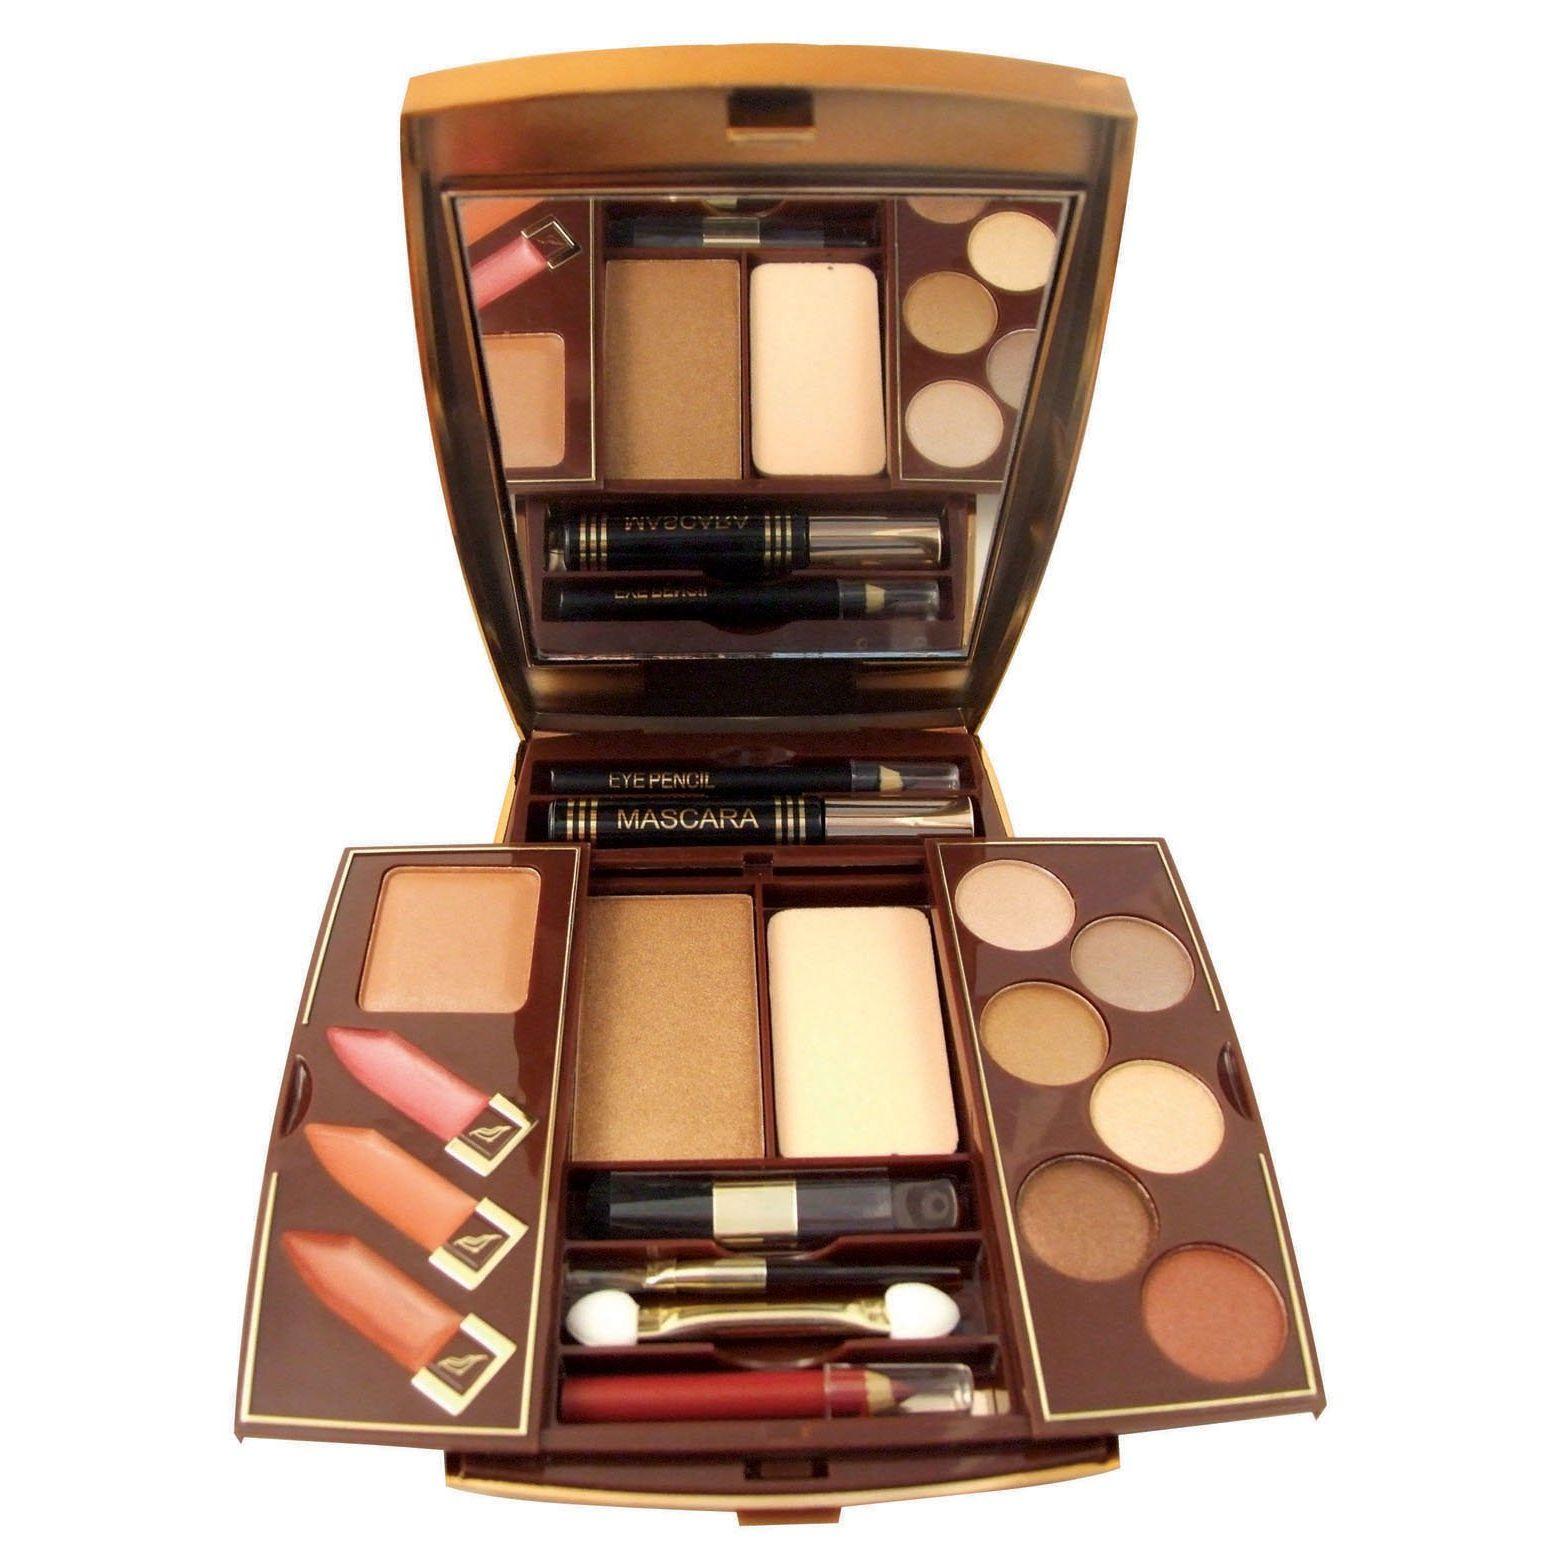 SUNkissed Cosmetics MakeUp Compact 2 Vari Prodotti